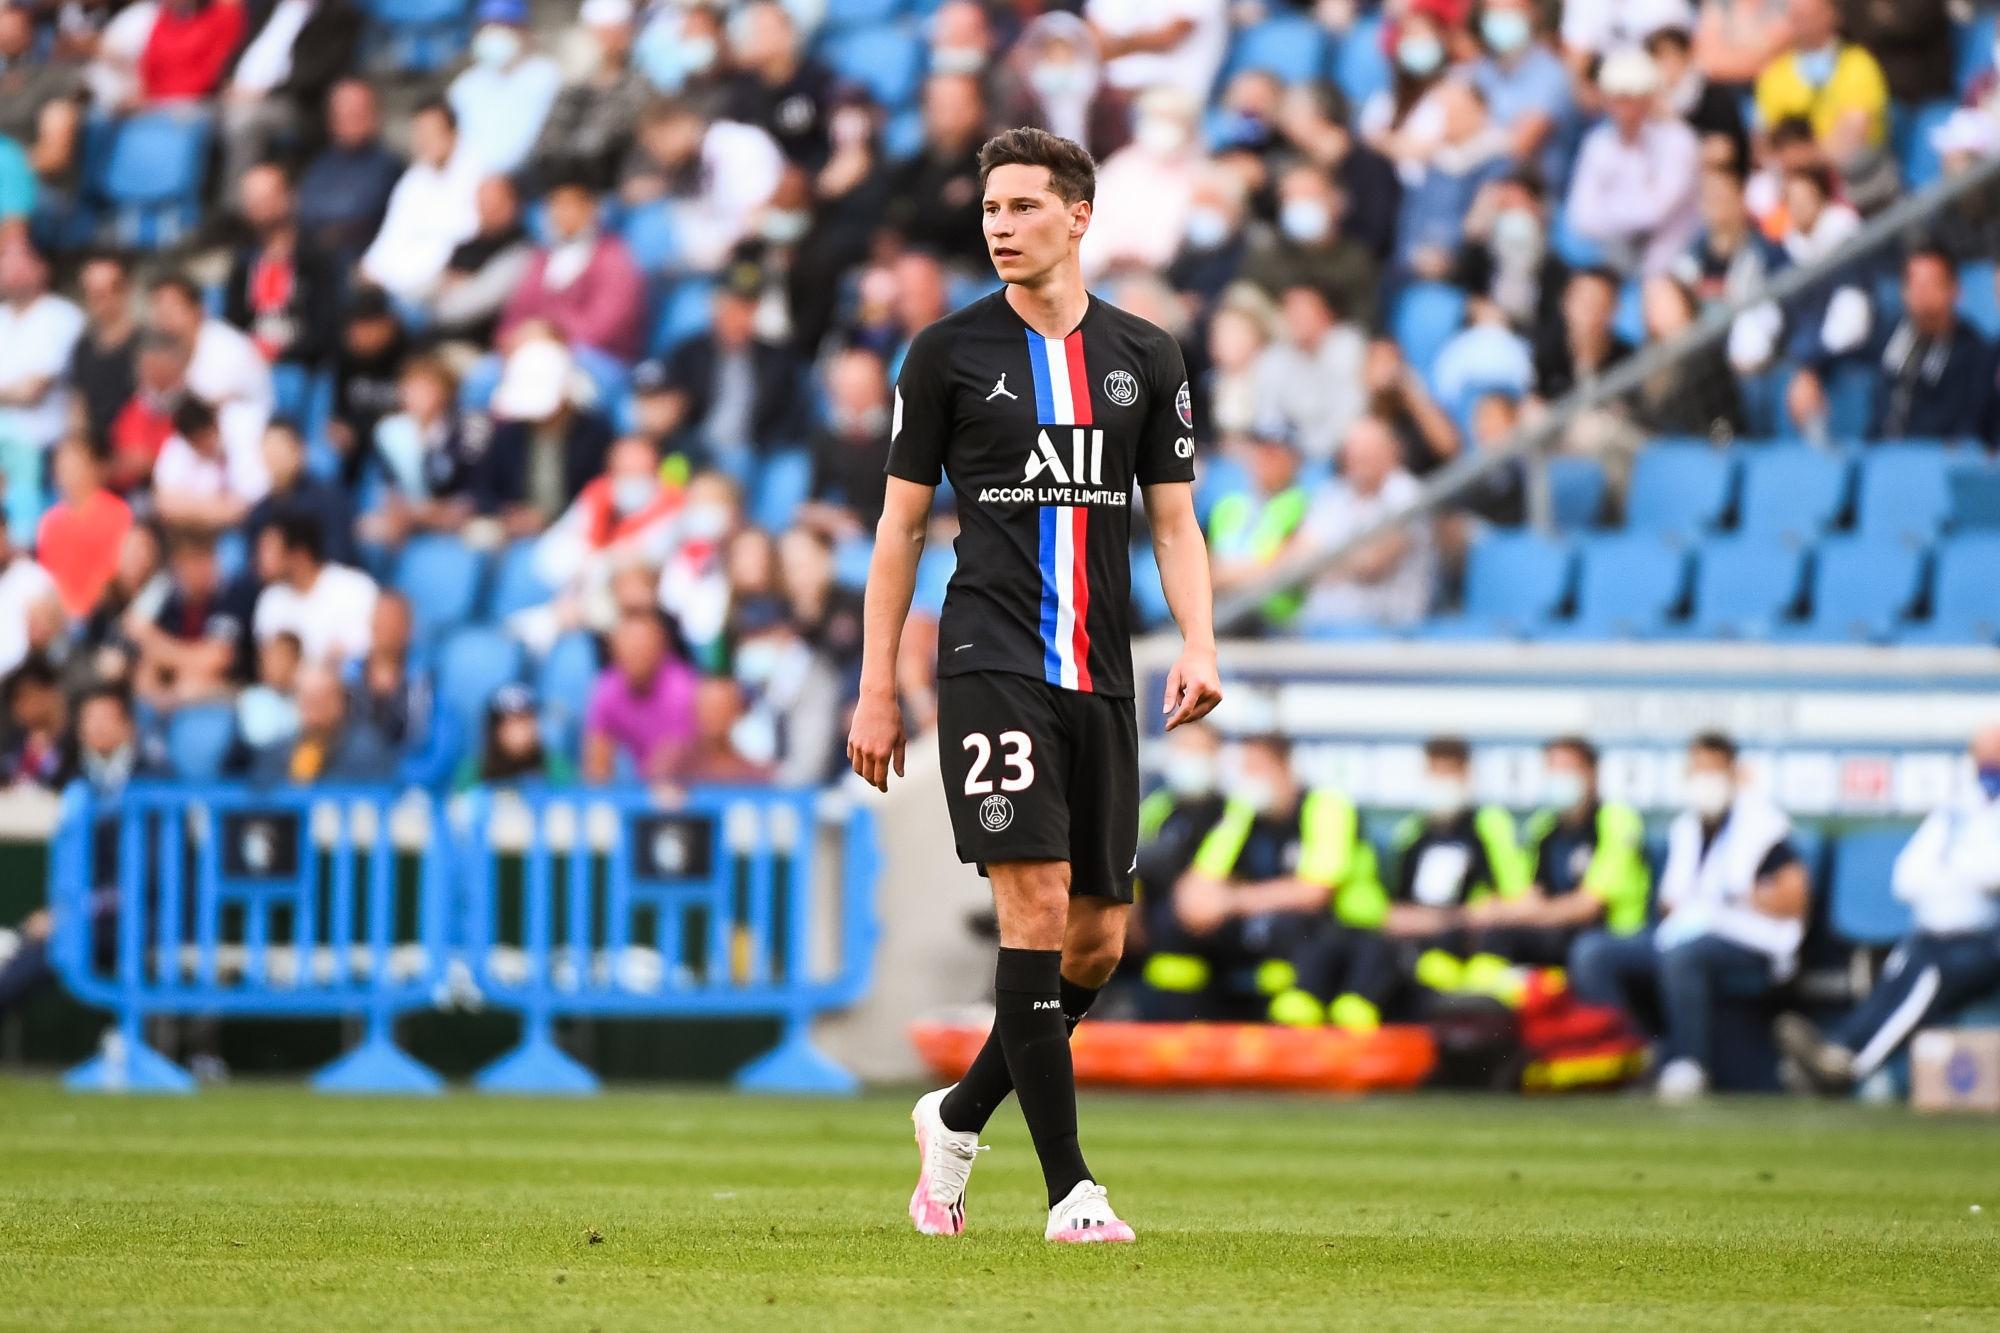 Mercato - Draxler ne partira finalement pas au Hertha Berlin, selon Sky